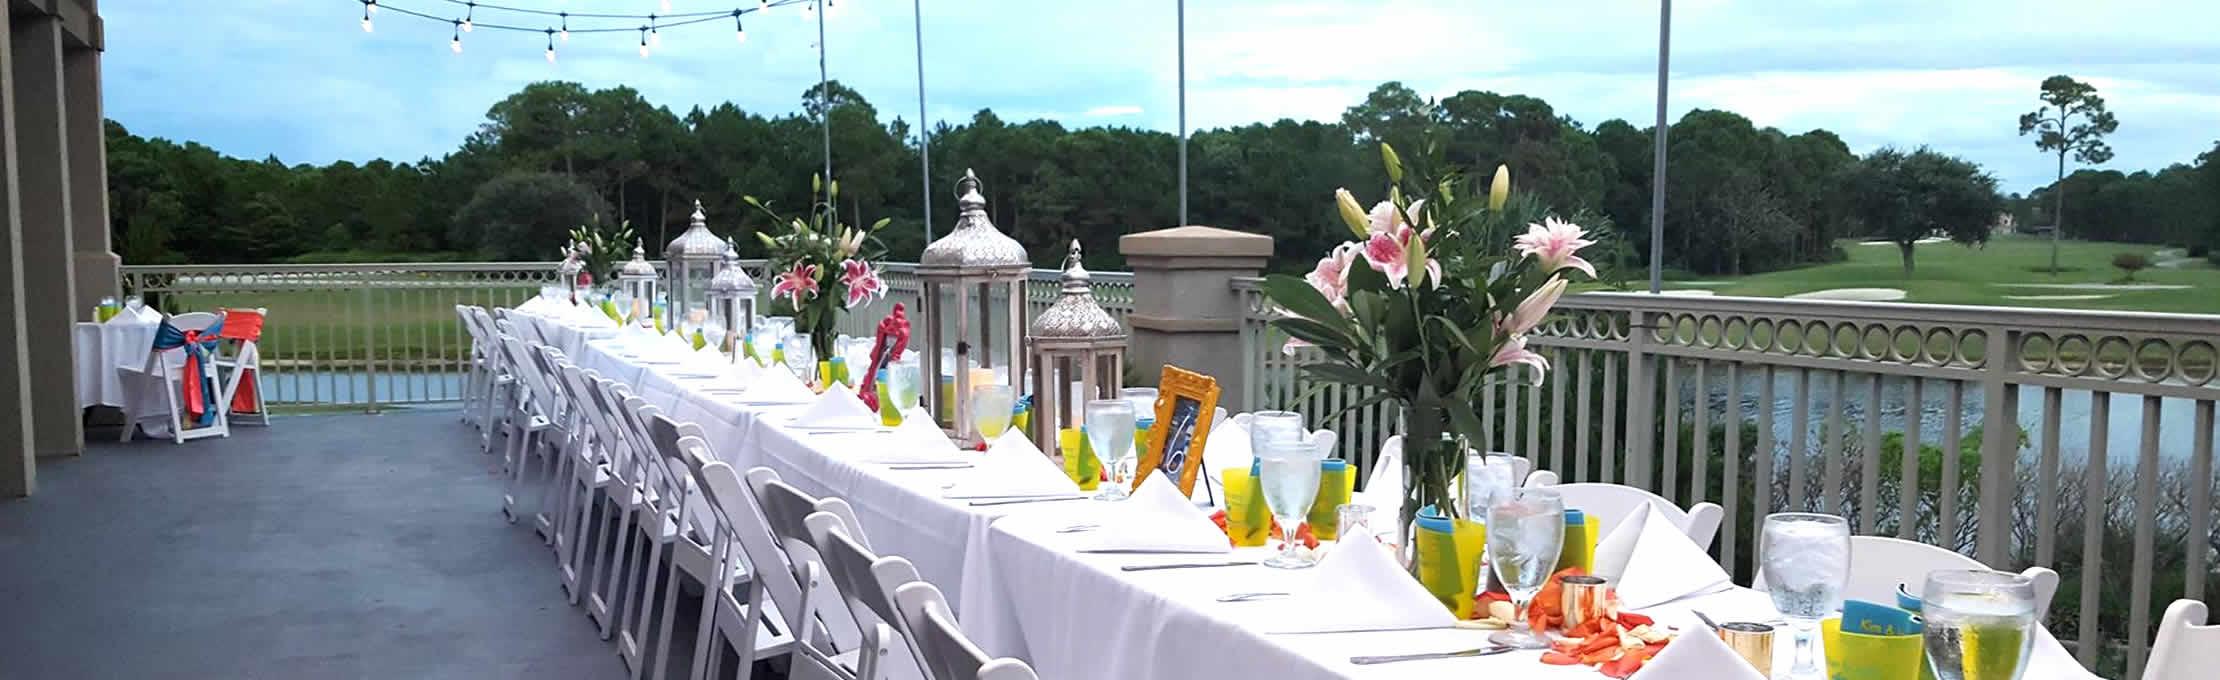 Destin Fl Weddings | Destin Florida Weddings At Seascape Resort Seascape Resort